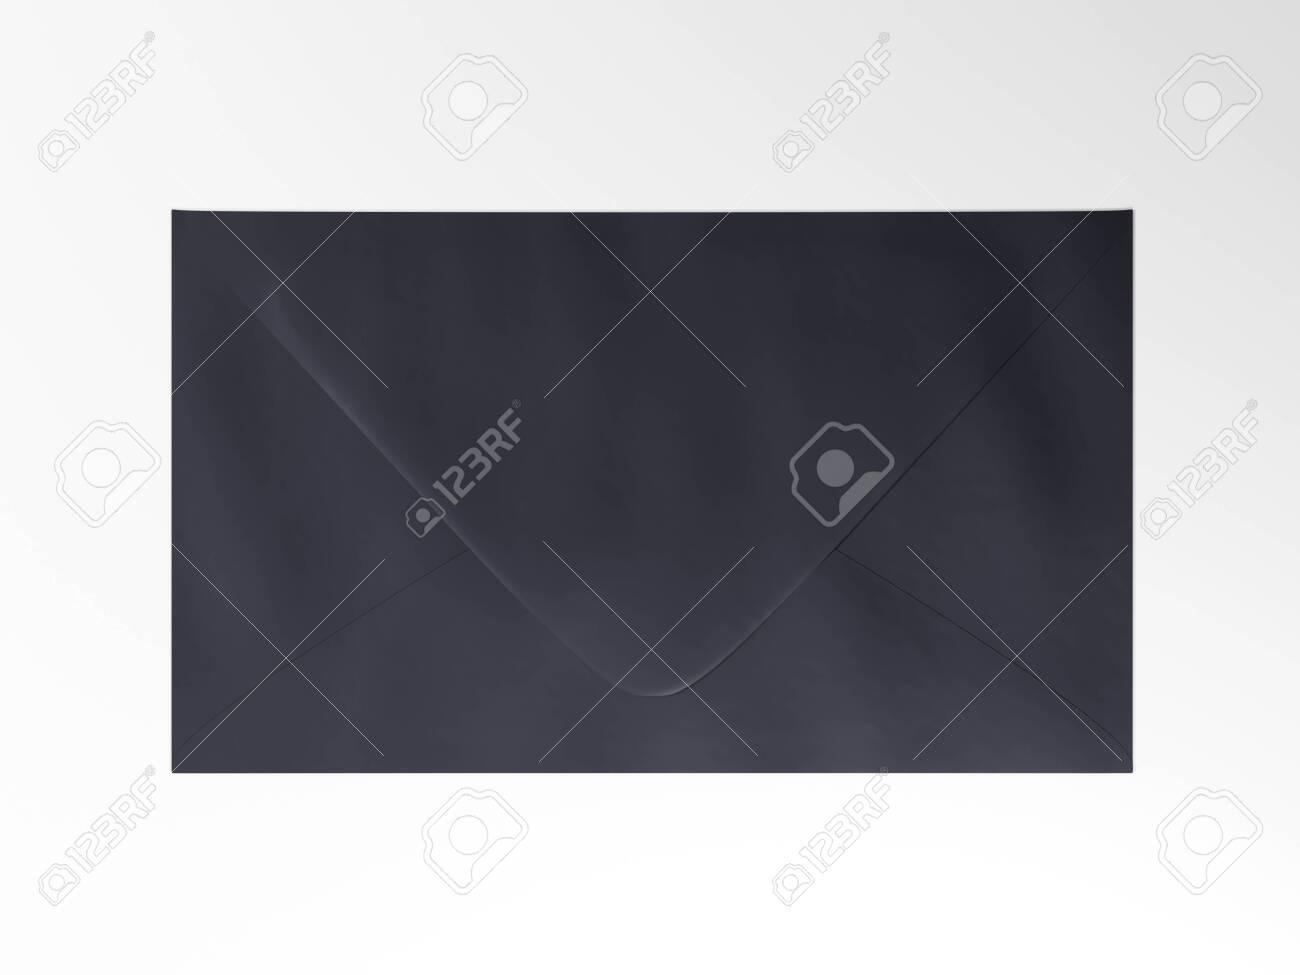 Envelope - 3d render mock up. Official business letter. Branding stationery for the office. Expensive luxury paper. Blue dark envelope lies on gray surface. Illustration for advert - 131785649